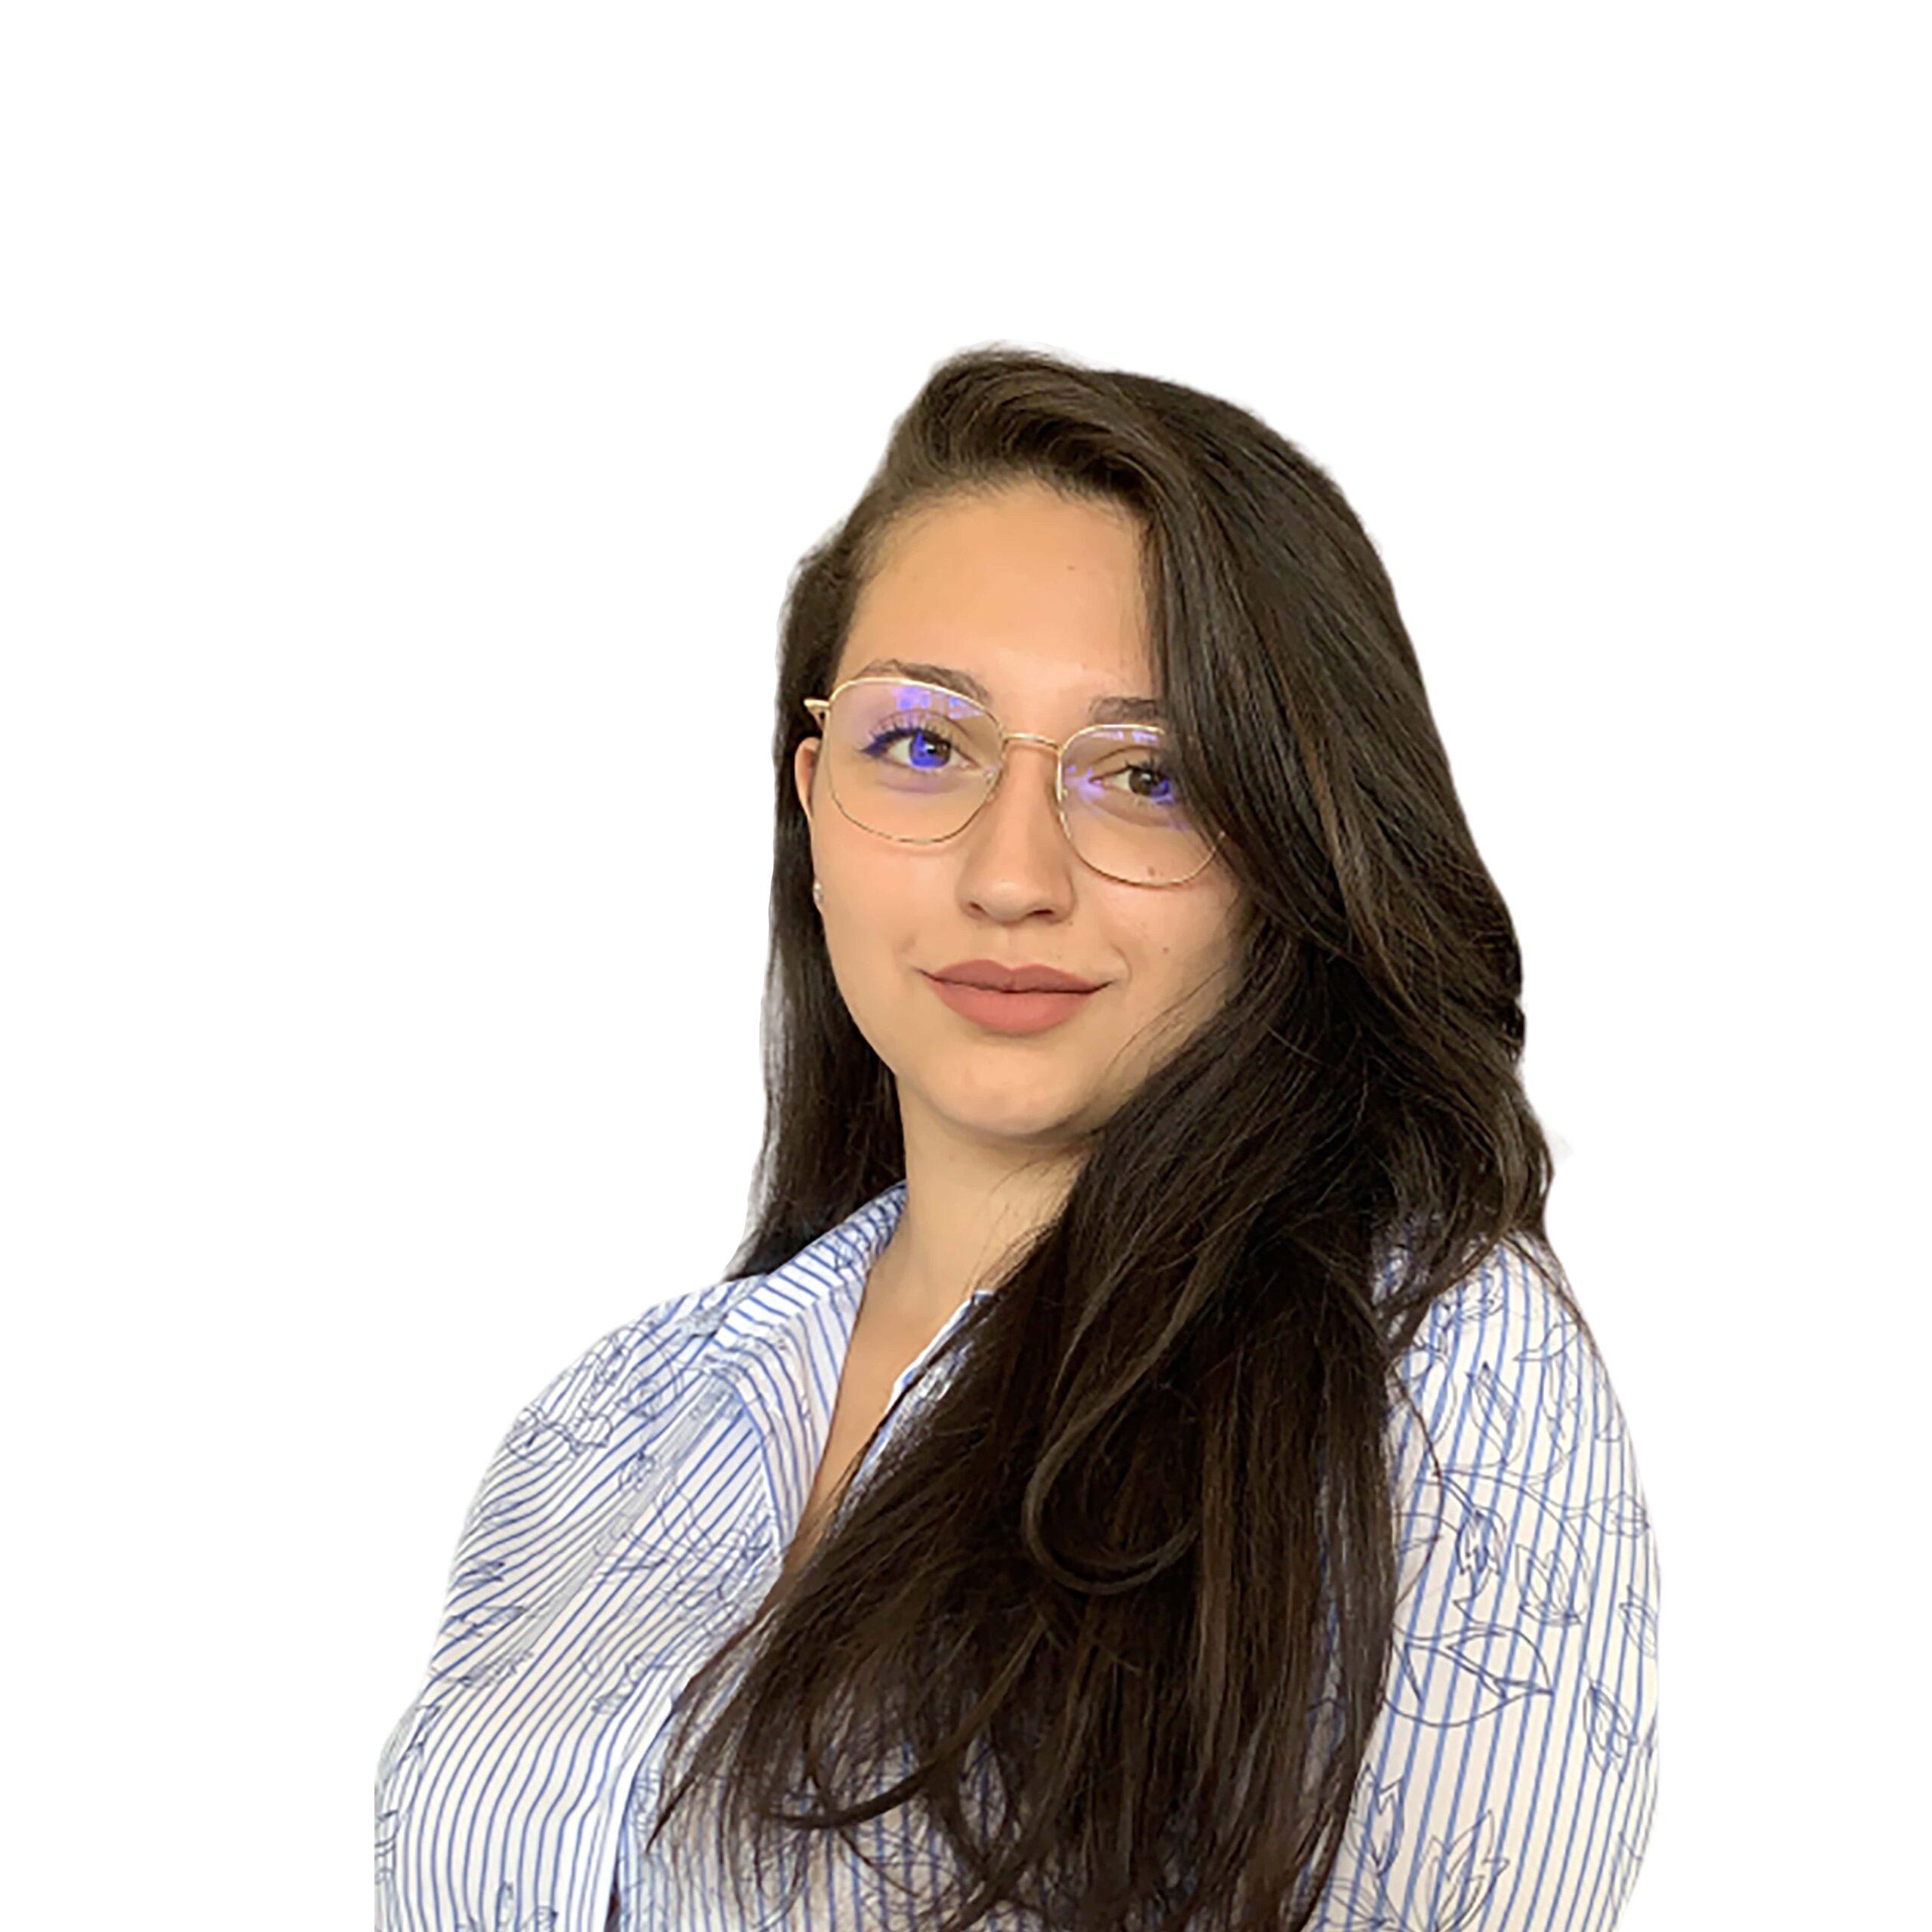 Ilaria Pizzolla